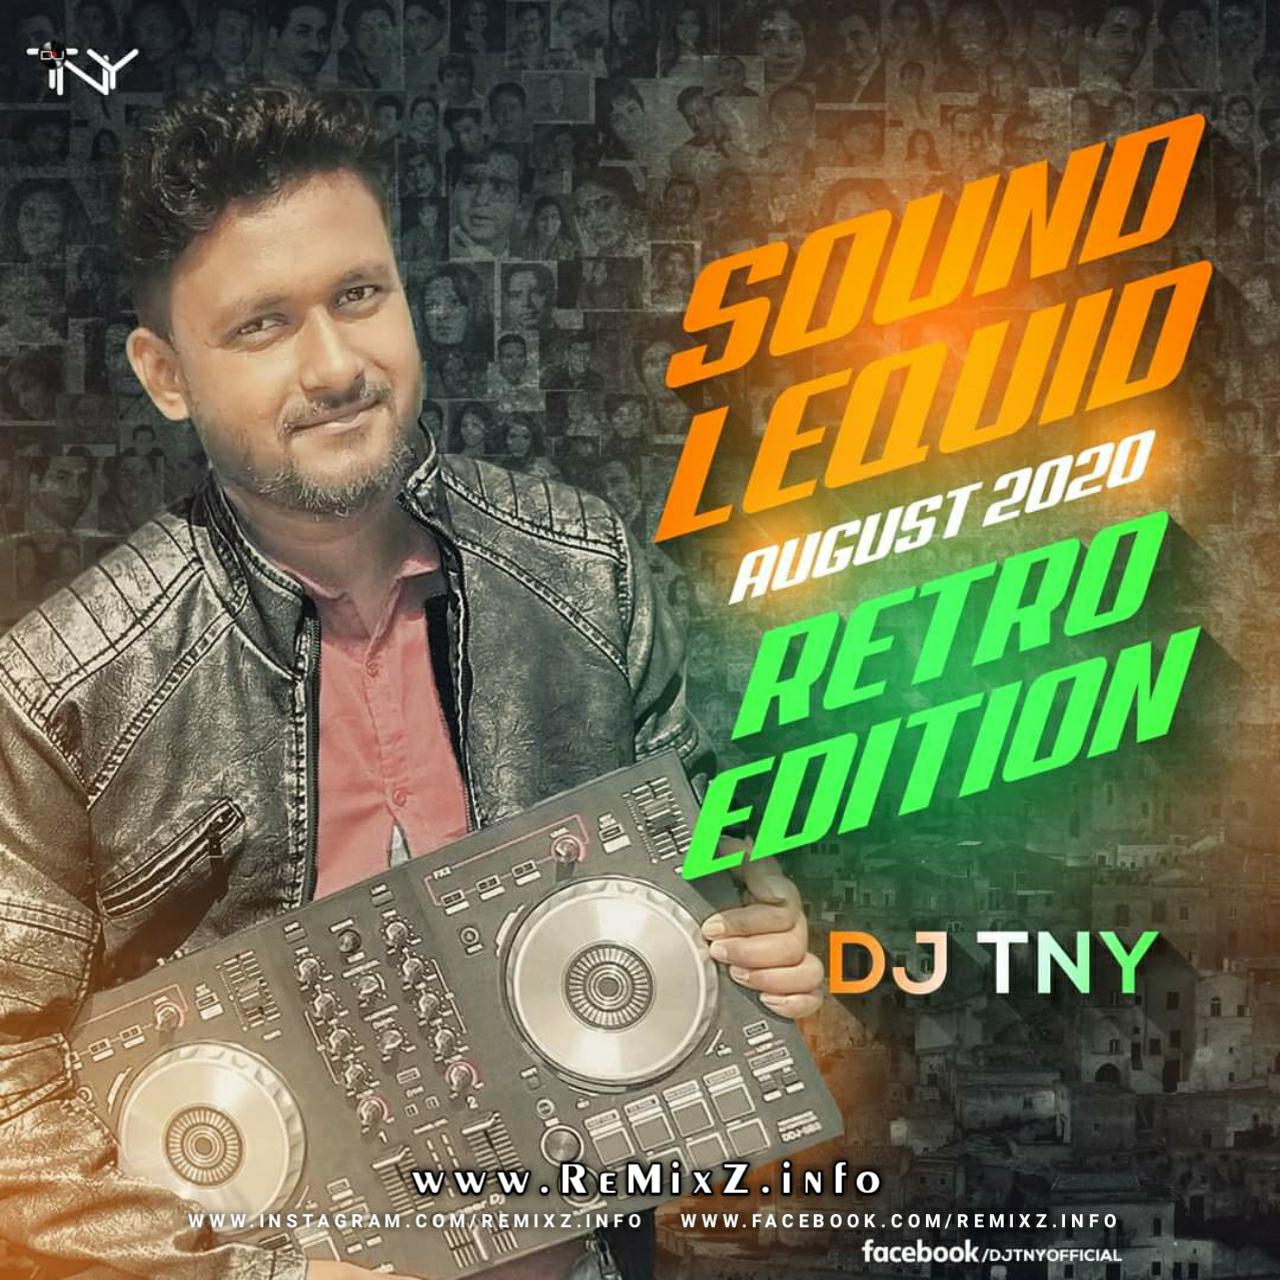 sound-lequid-august-2k20-retro-edition-djtny.jpg